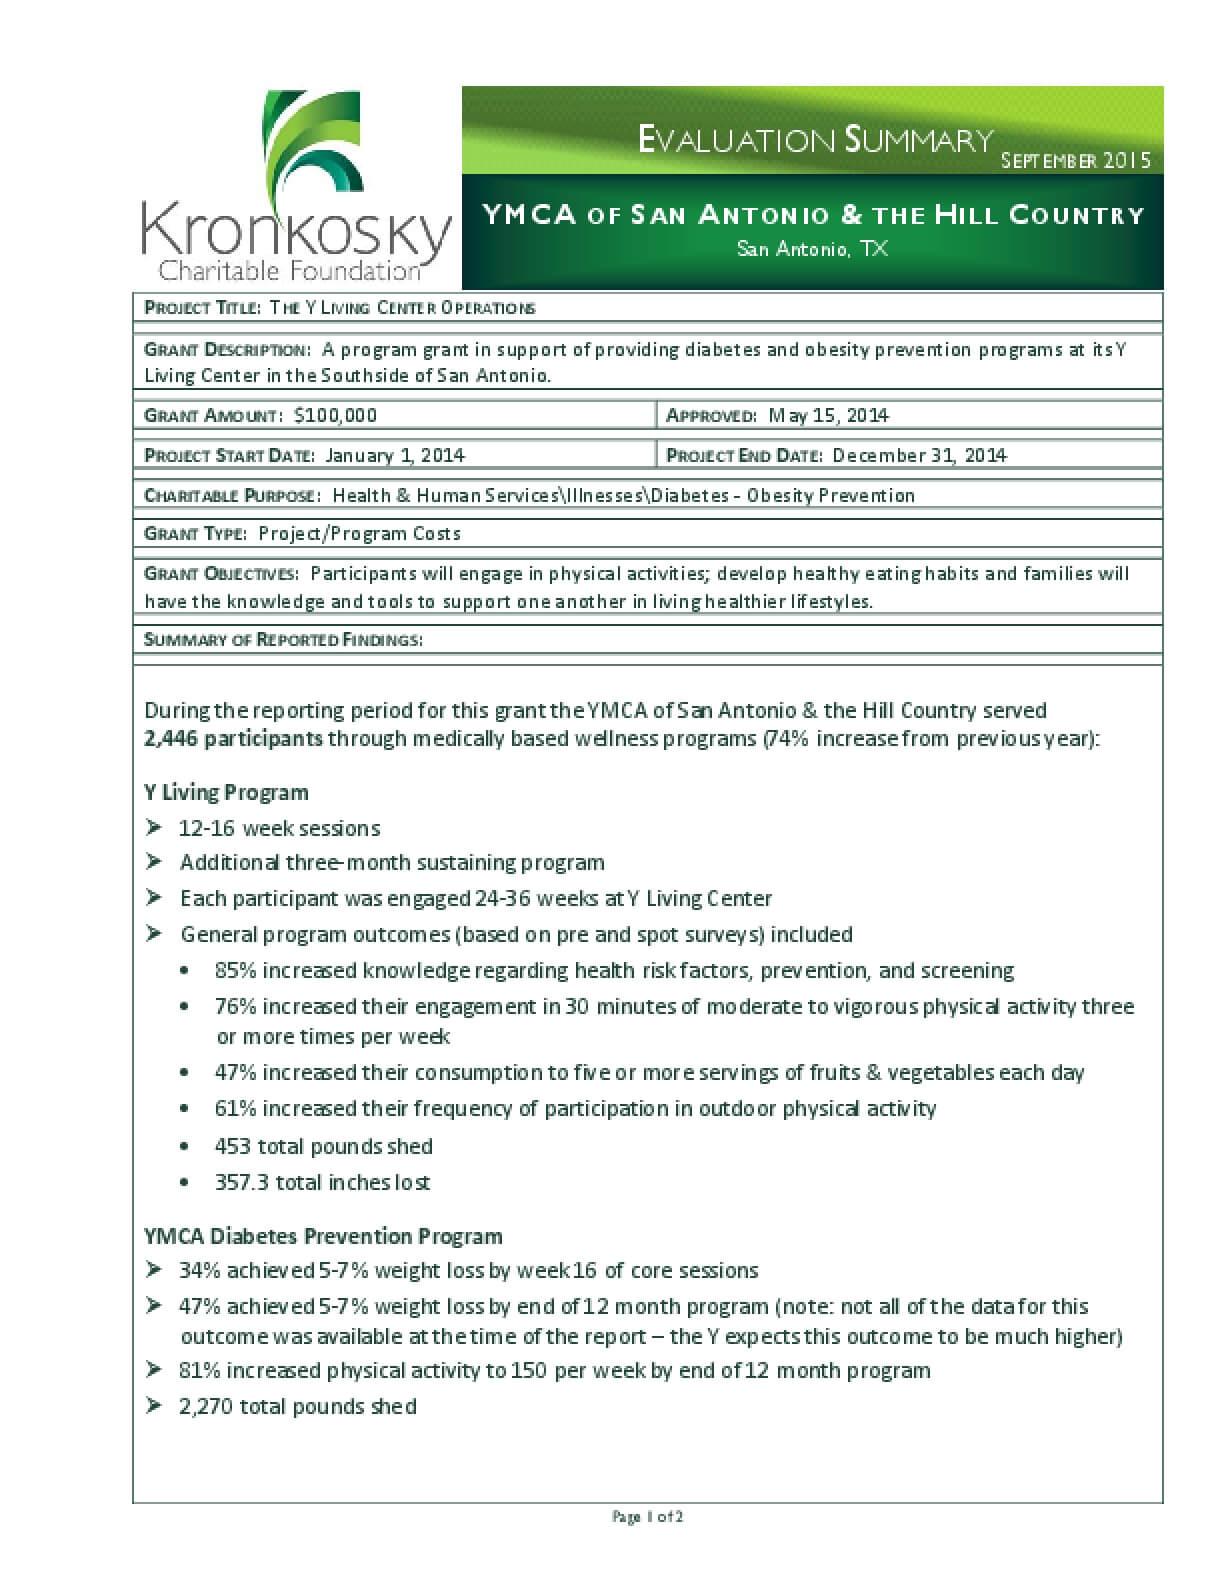 YMCA of San Antonio & the Hill Country Evaluation Summary